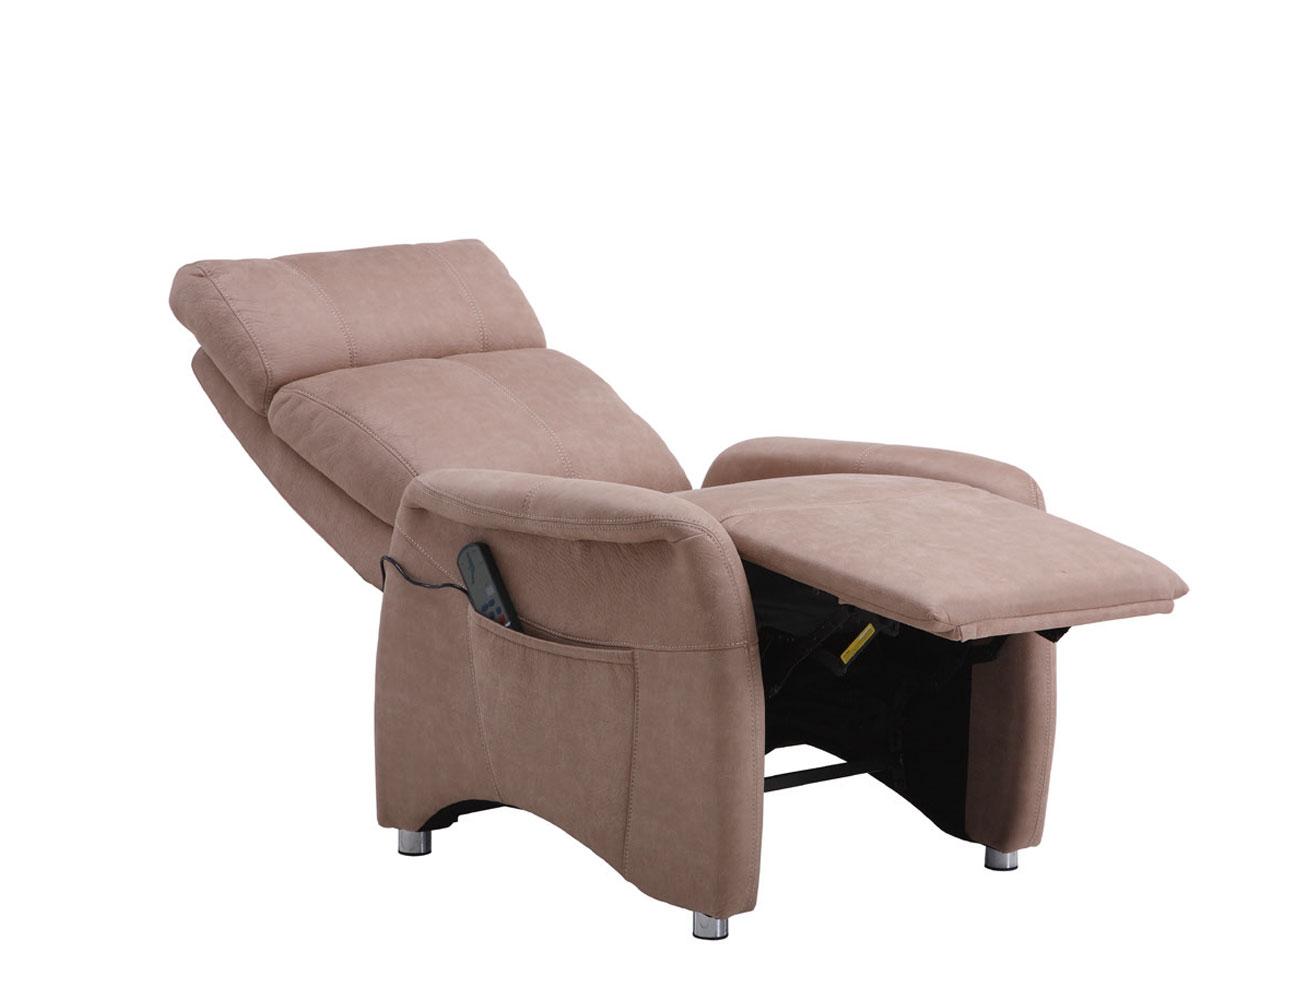 Sillon relax masaje vibracion camel 2